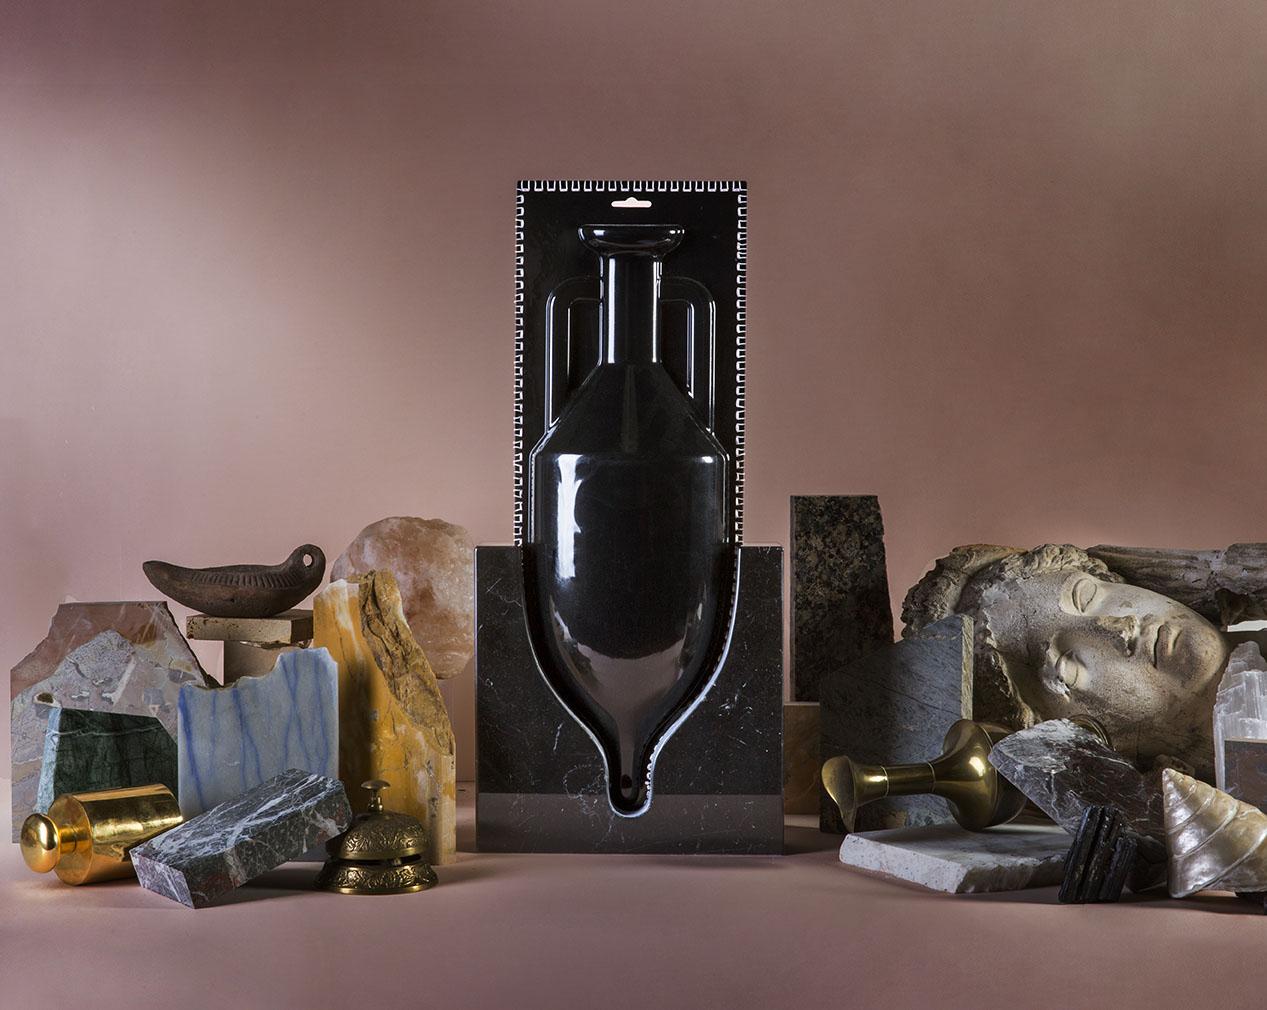 Secondome - Divina Sproporzione - Amphora - Gio Tirotto.jpg